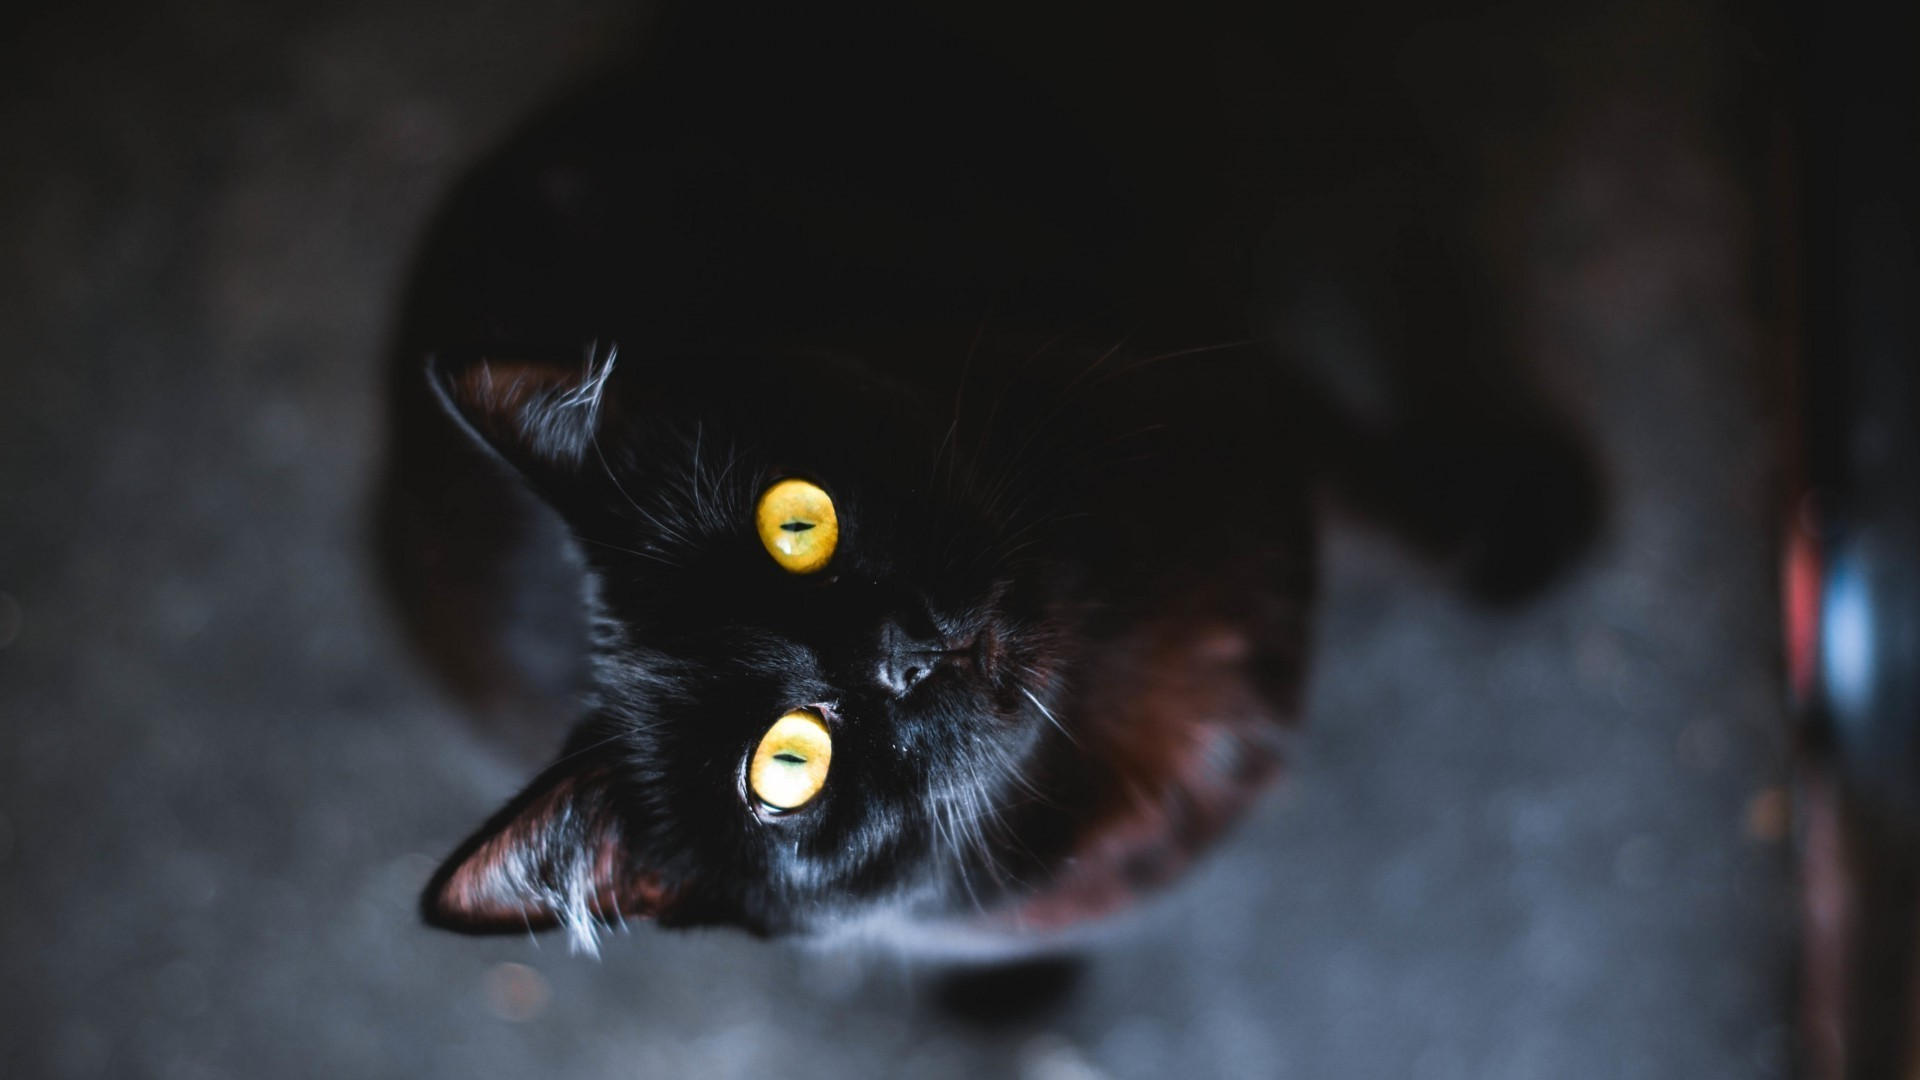 Black Cat full hd wallpaper